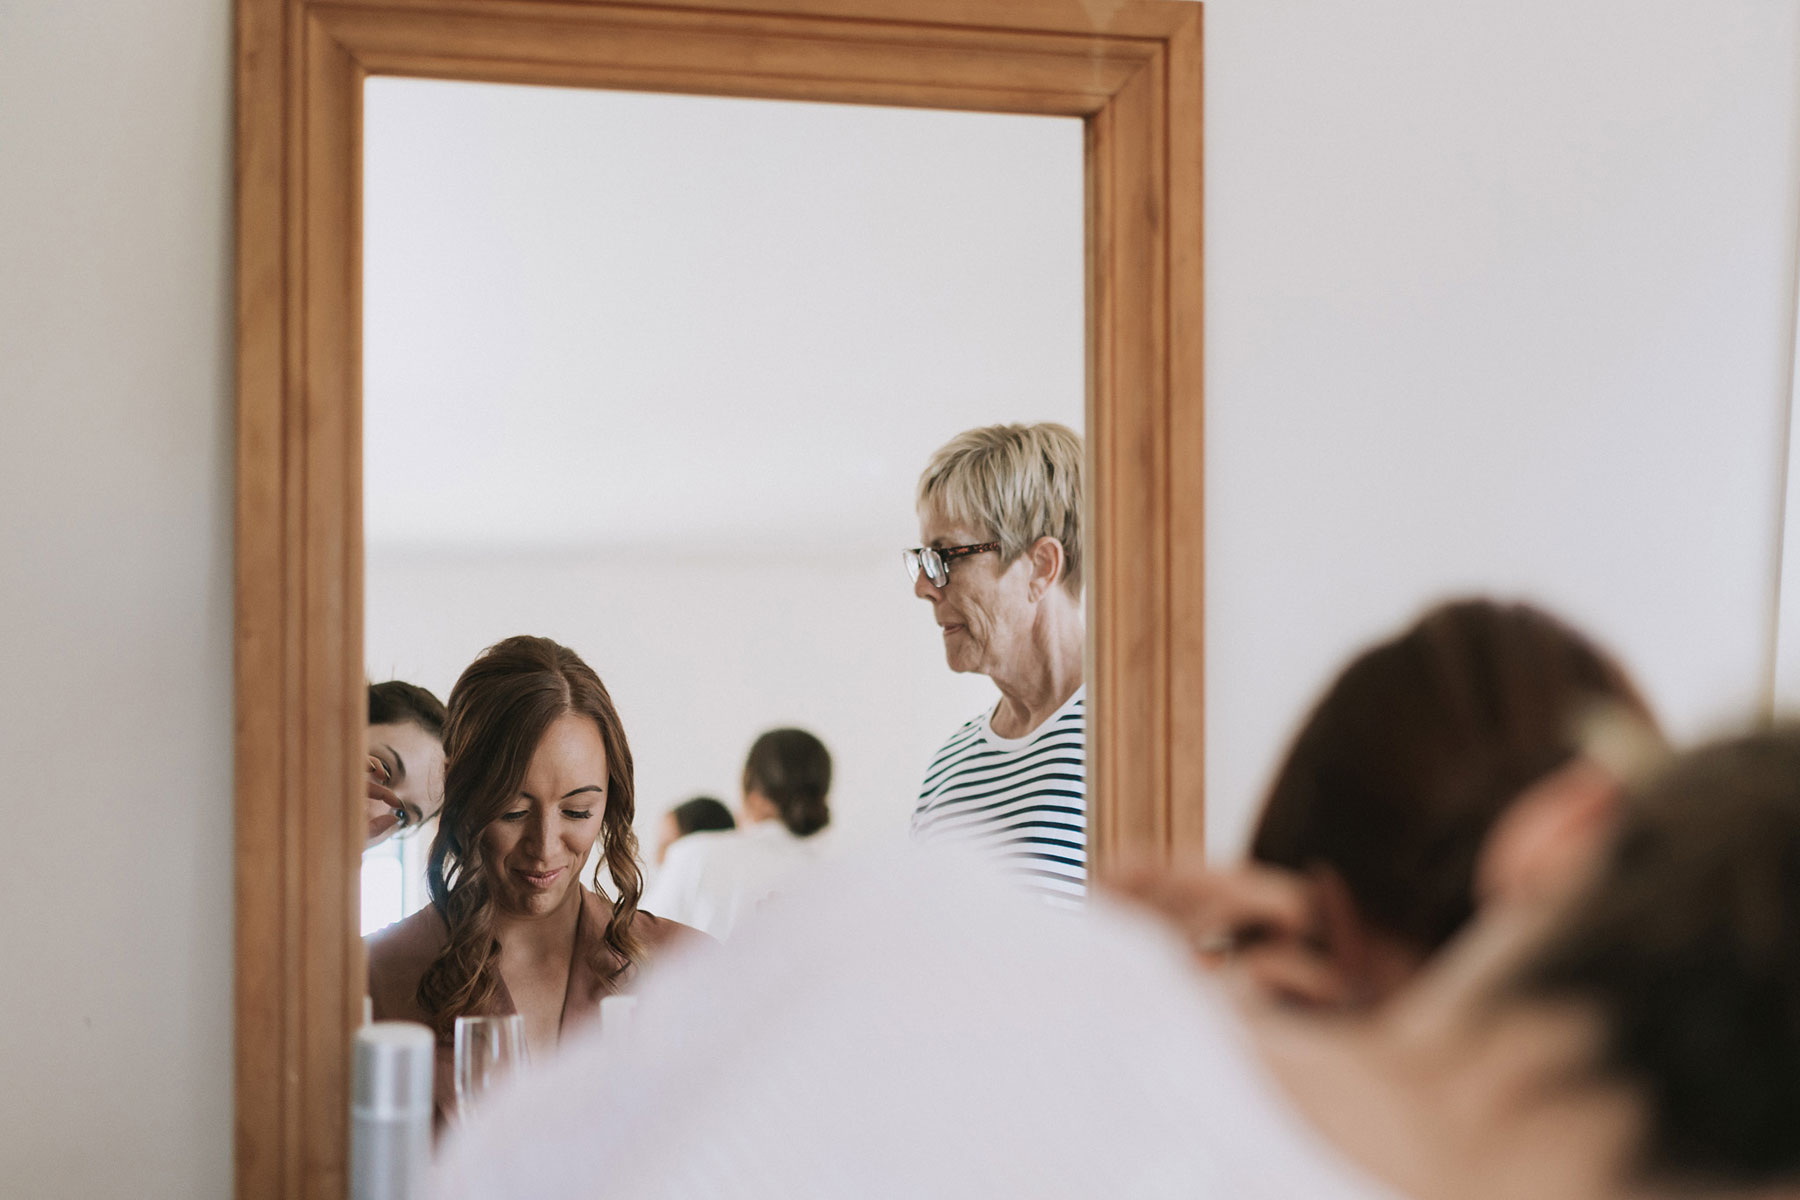 newfound-j-n-orua-beach-house-coromandel-wedding-photographers-62